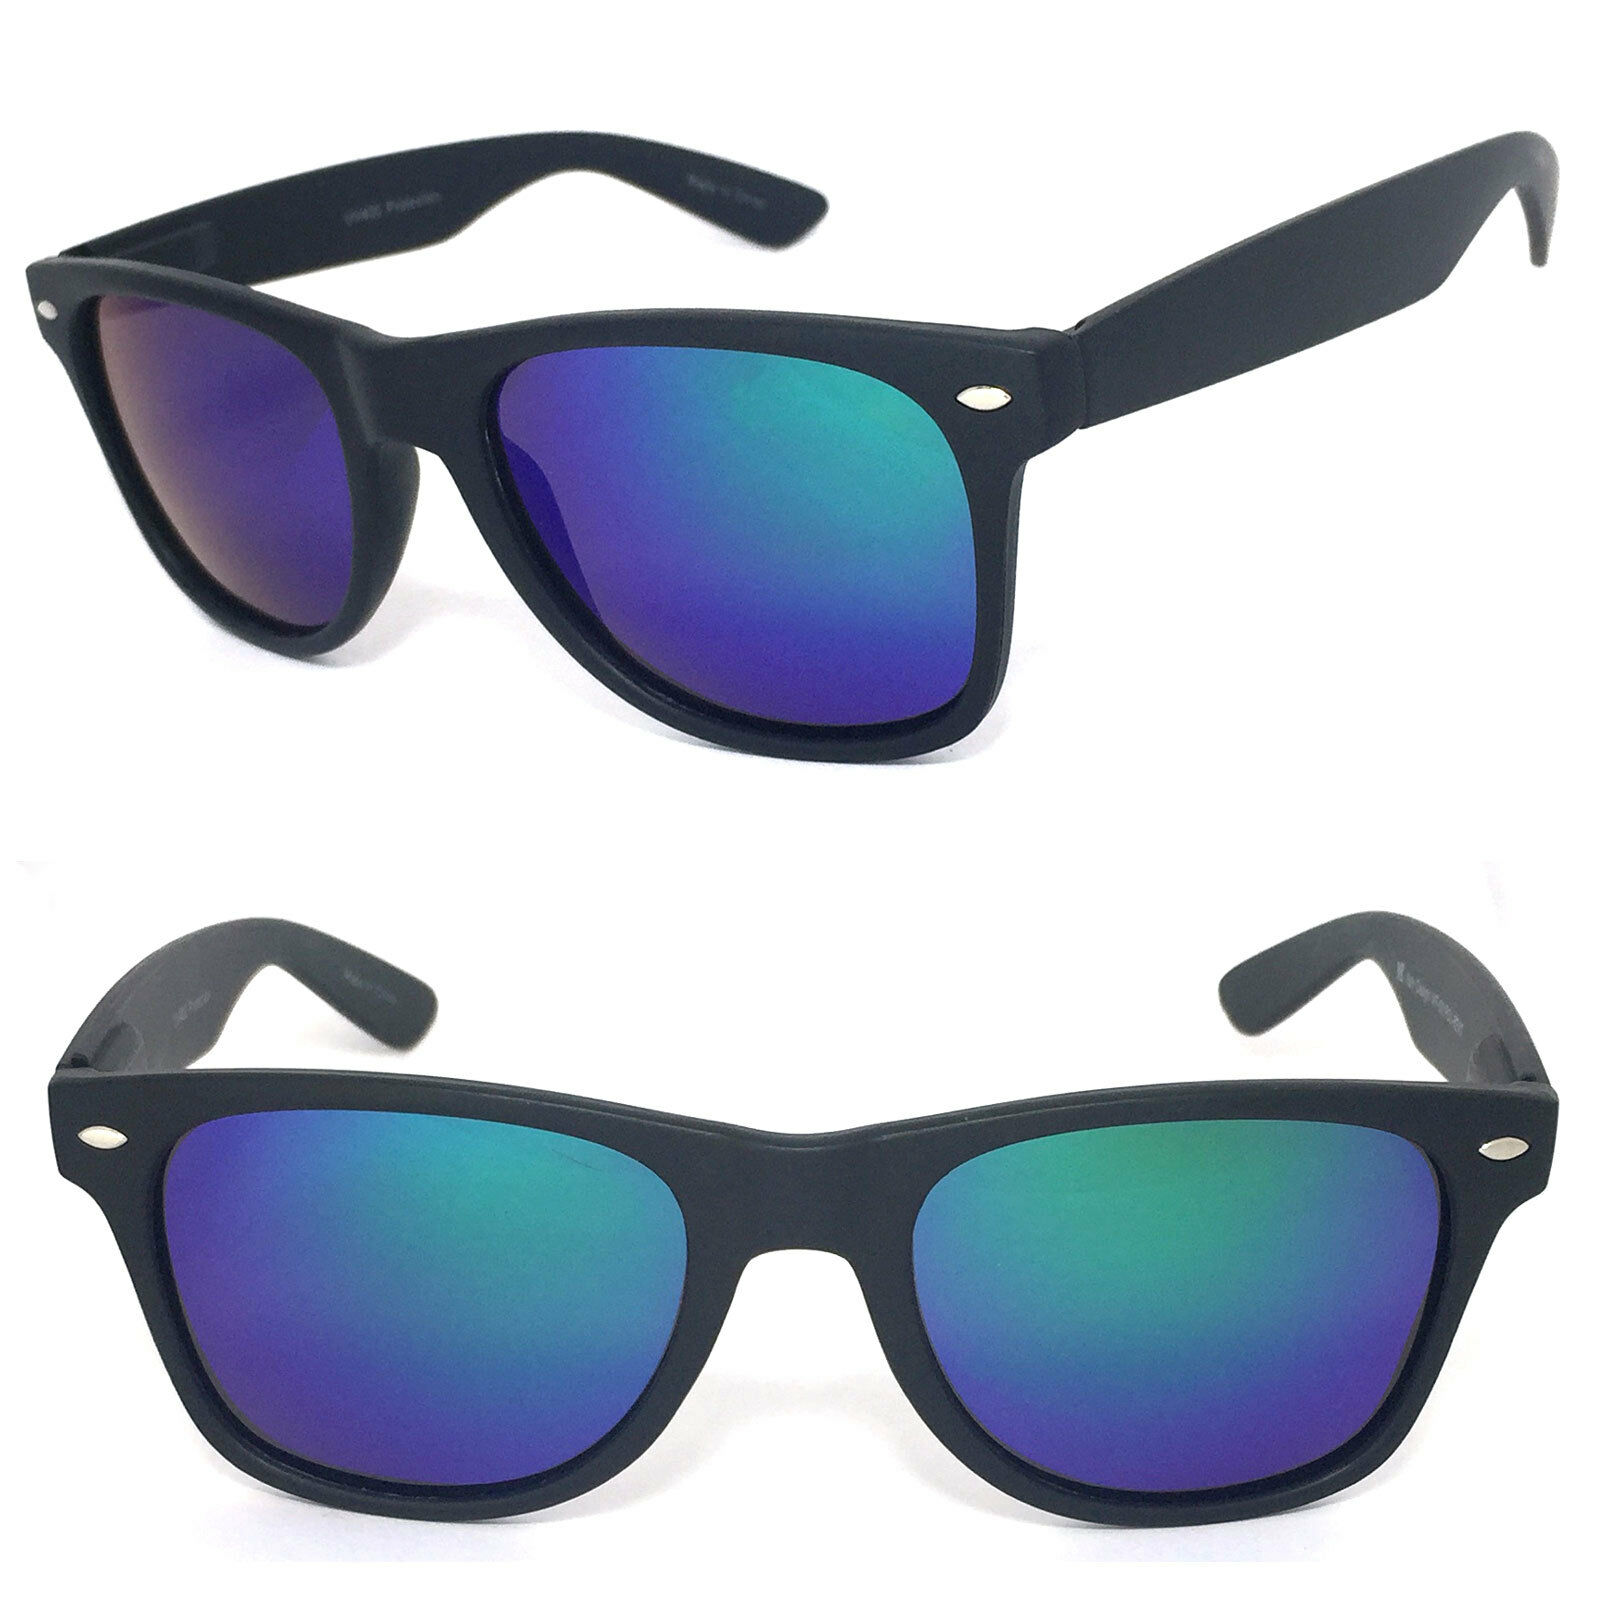 Polarized Retro Square Frame Sunglasses 52mm Matte Black Blue Green ...